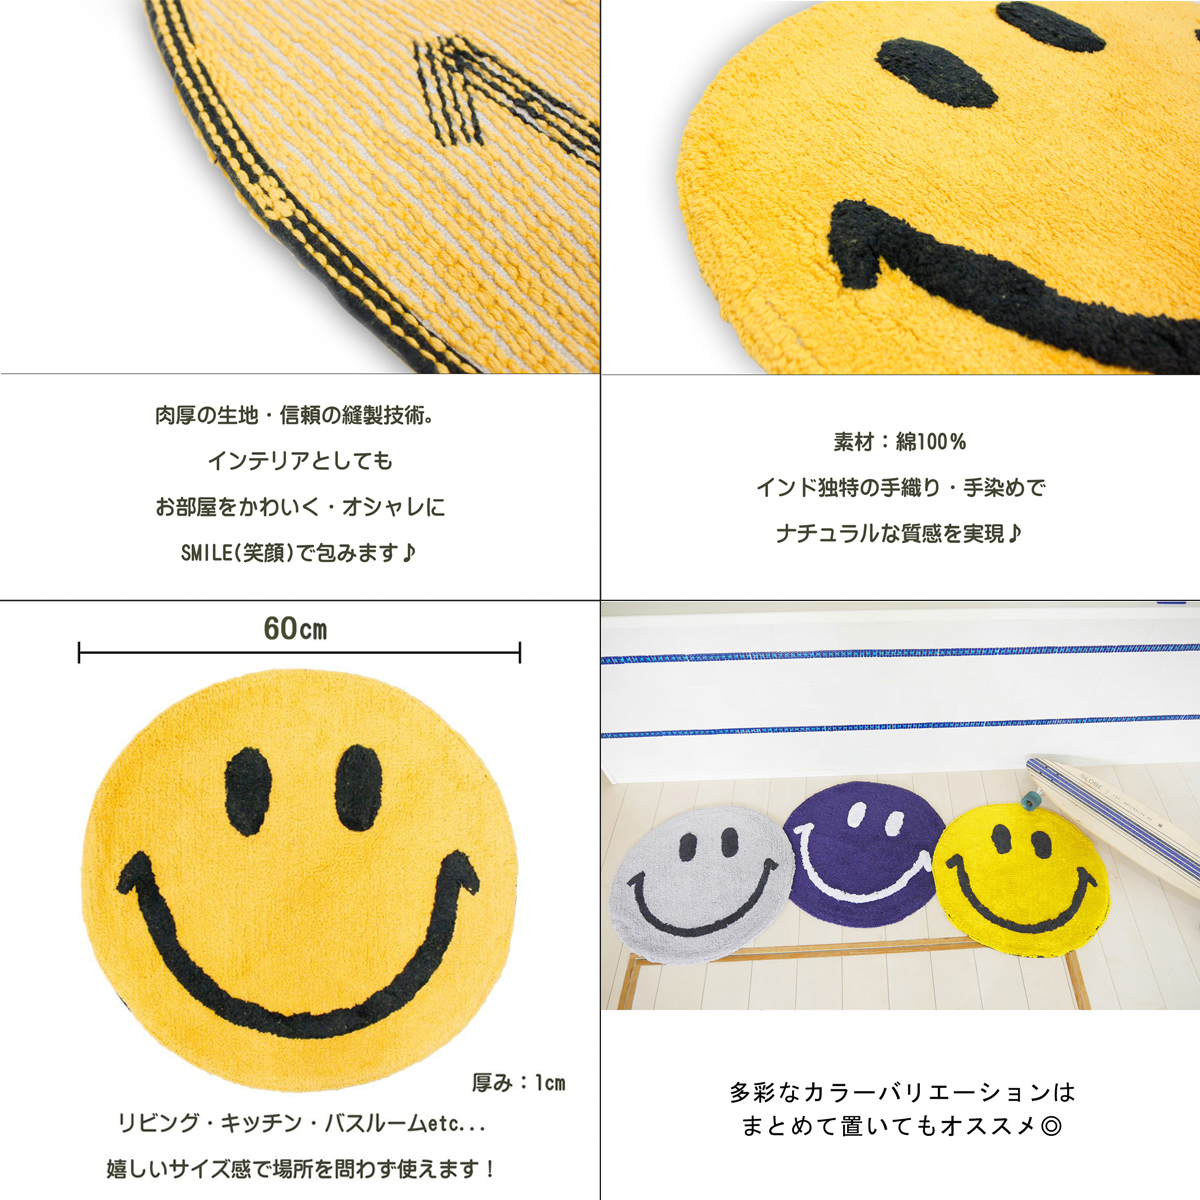 SMILE SERIES スマイルシリーズ SMILE RAG ニコちゃん にこちゃん ラグマット